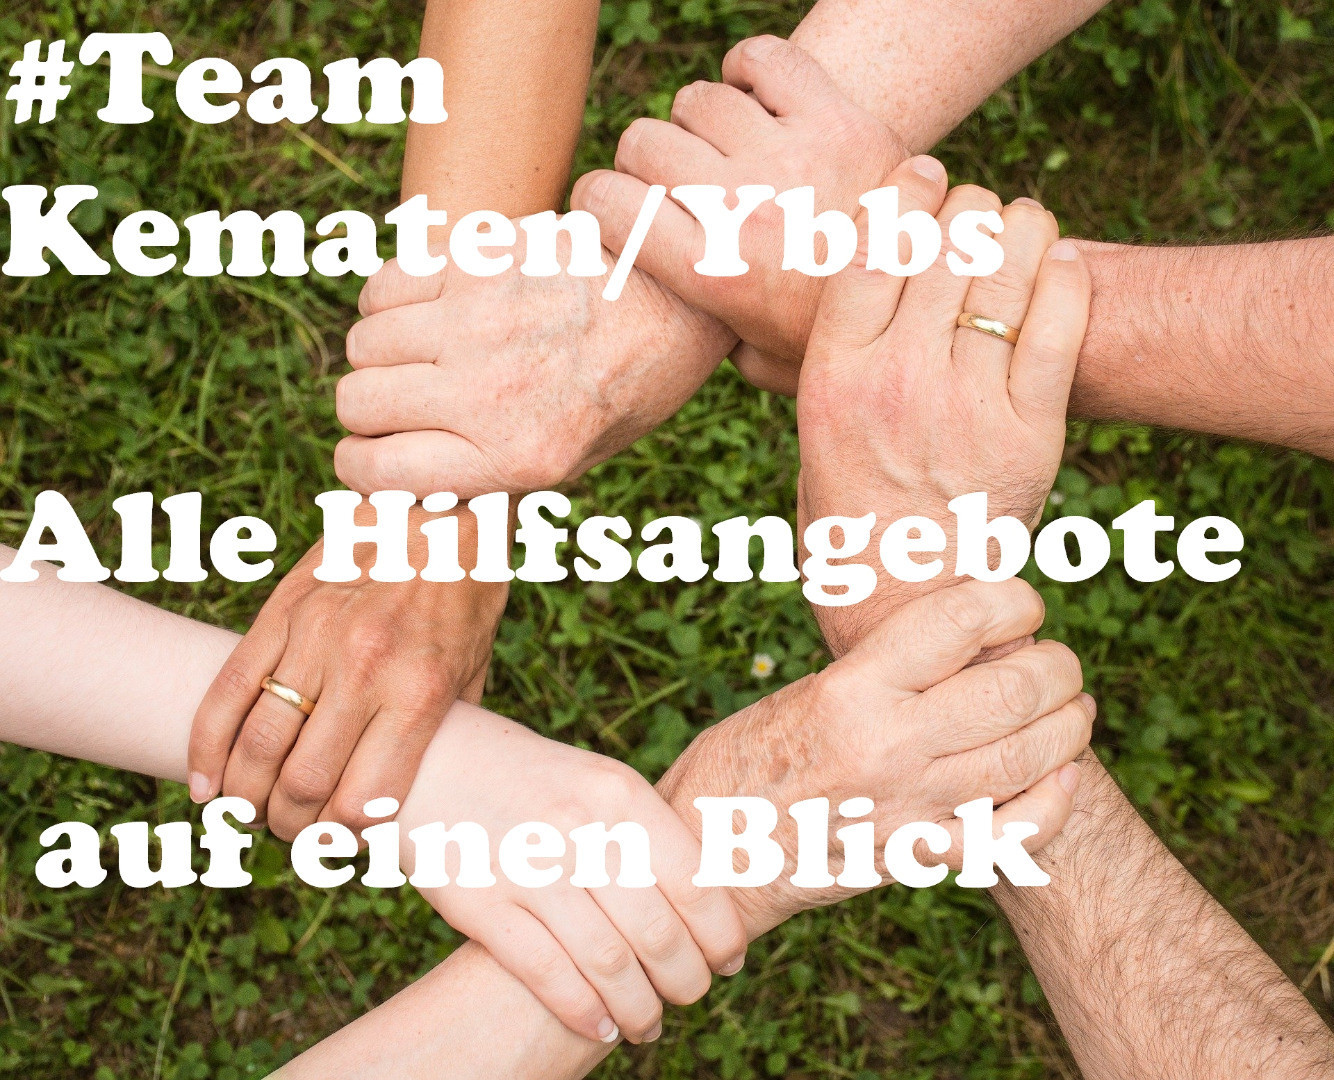 team-spirit-2447163_1920 (1)a.jpg